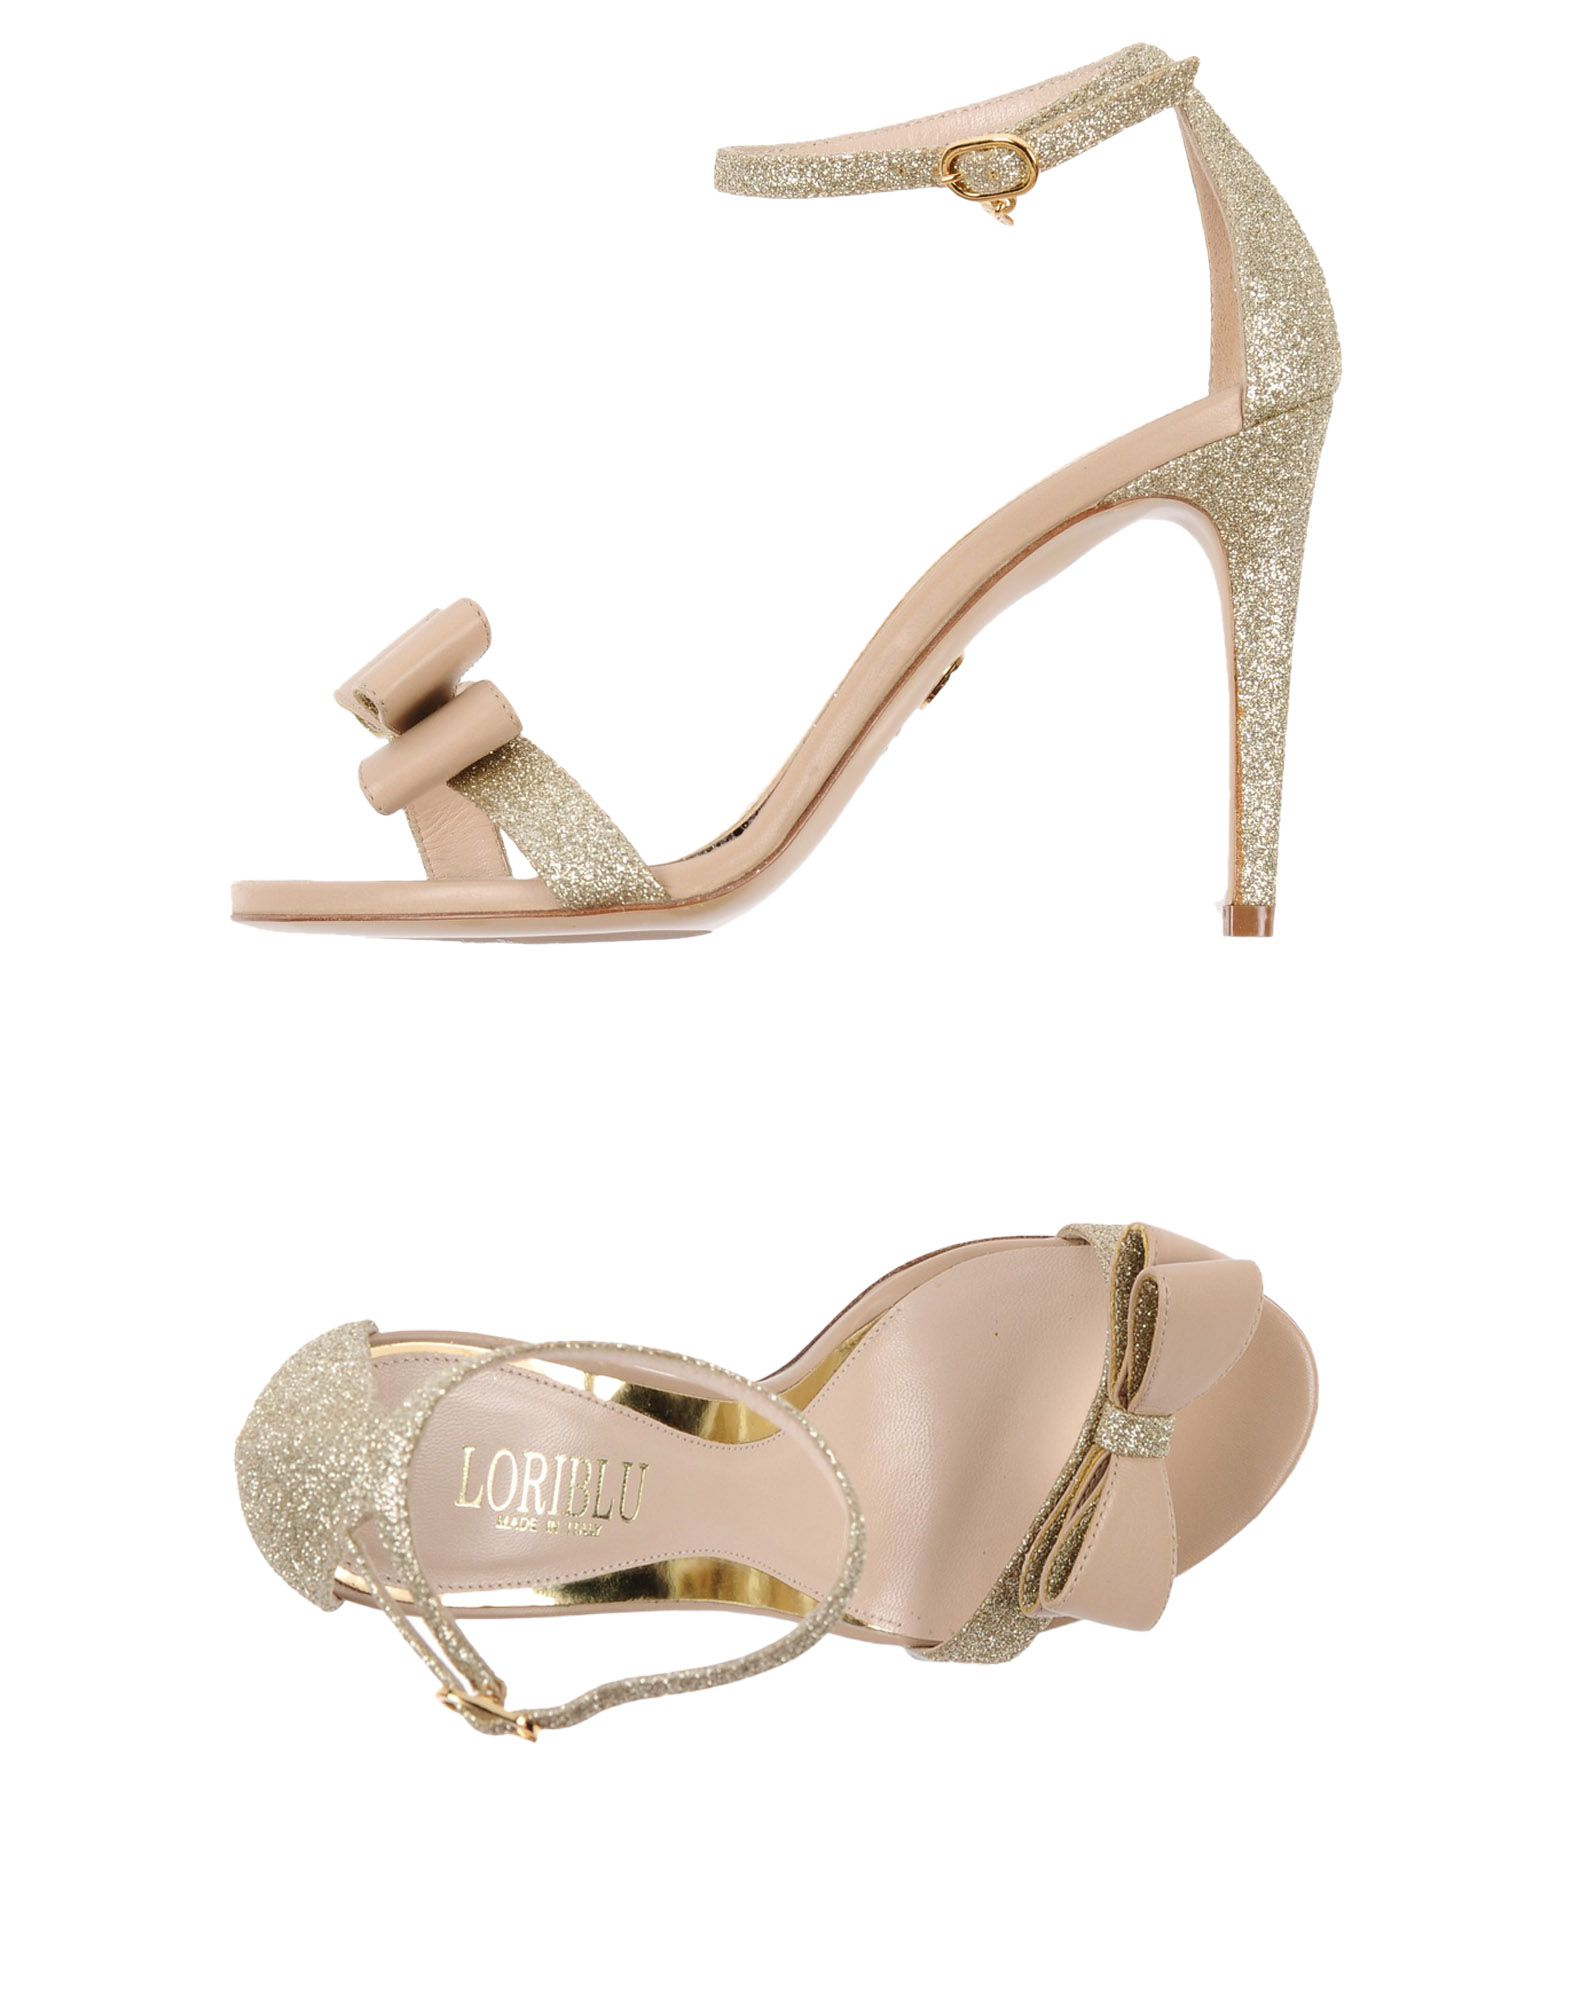 Stilvolle billige Schuhe Damen Loriblu Sandalen Damen Schuhe  11461239GU 37c1b9